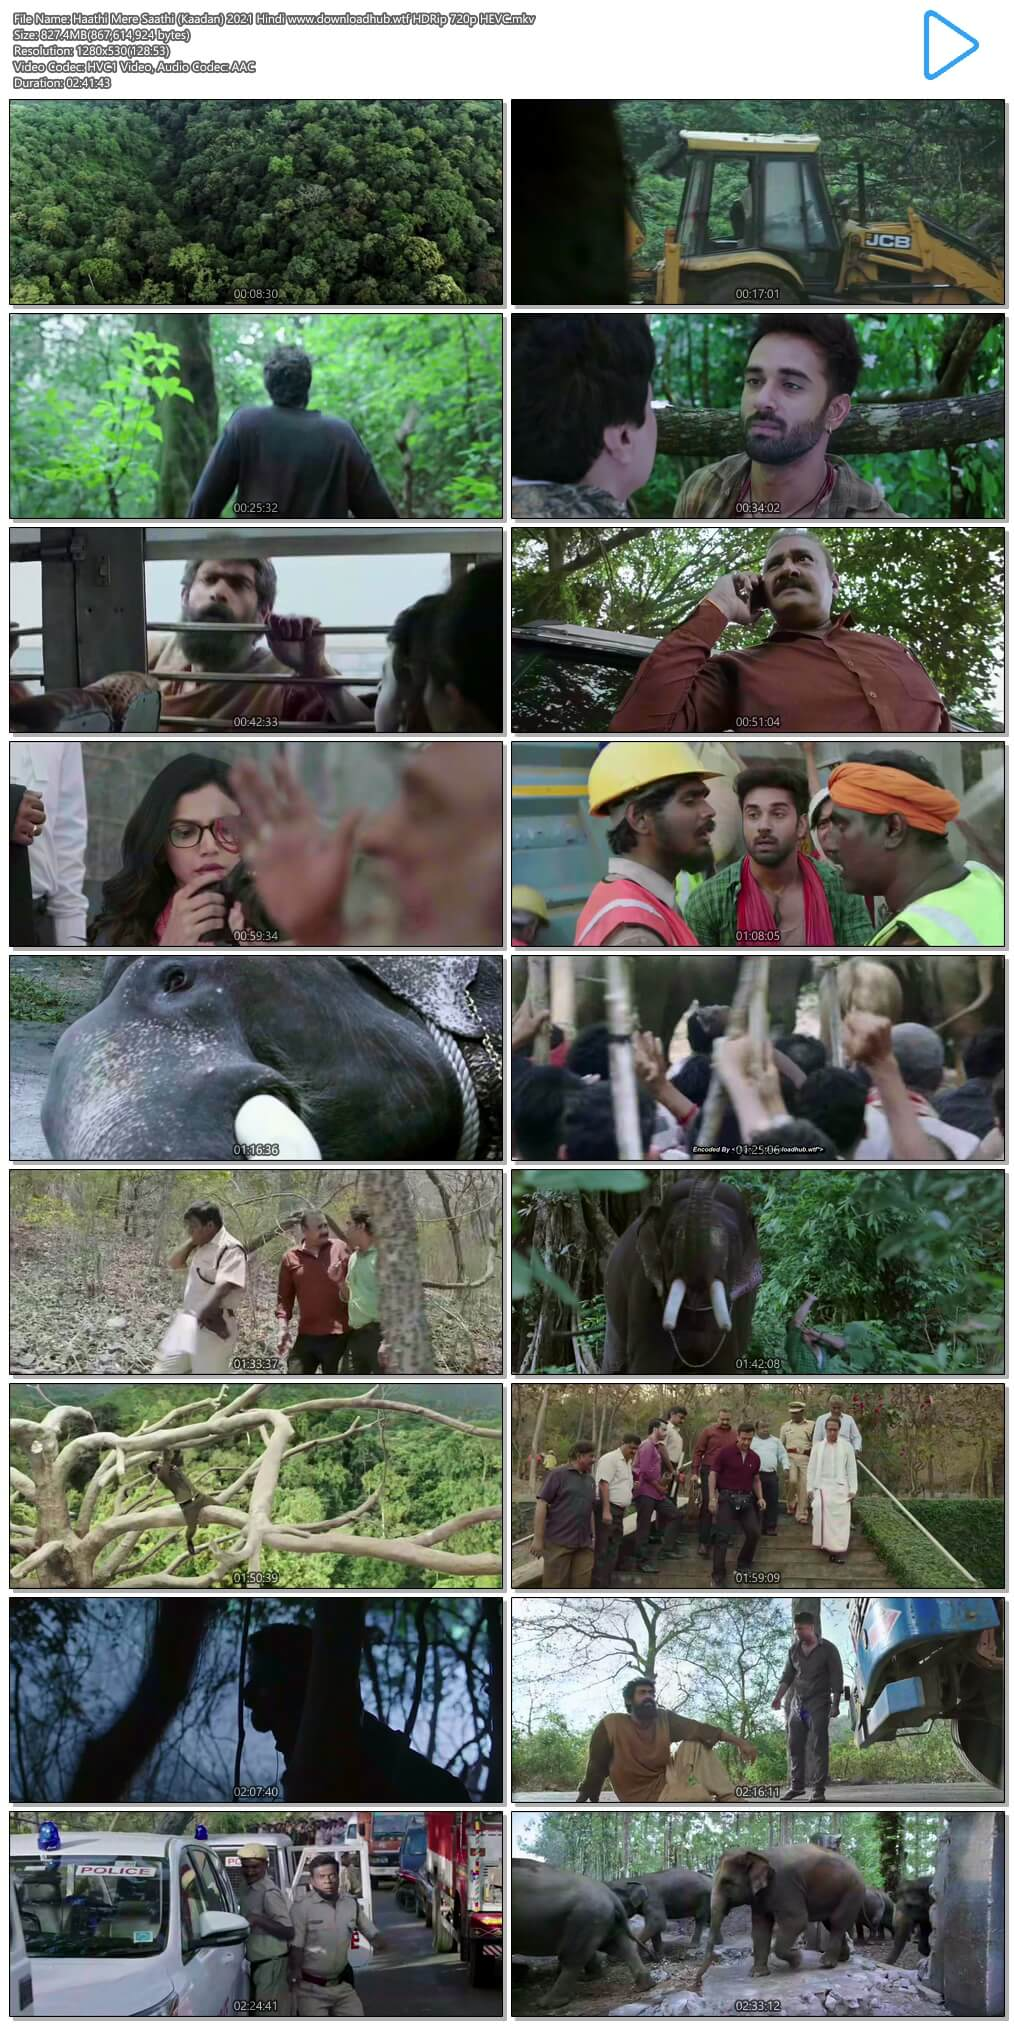 Haathi Mere Saathi (Kaadan) 2021 Hindi 800MB HDRip 720p HEVC